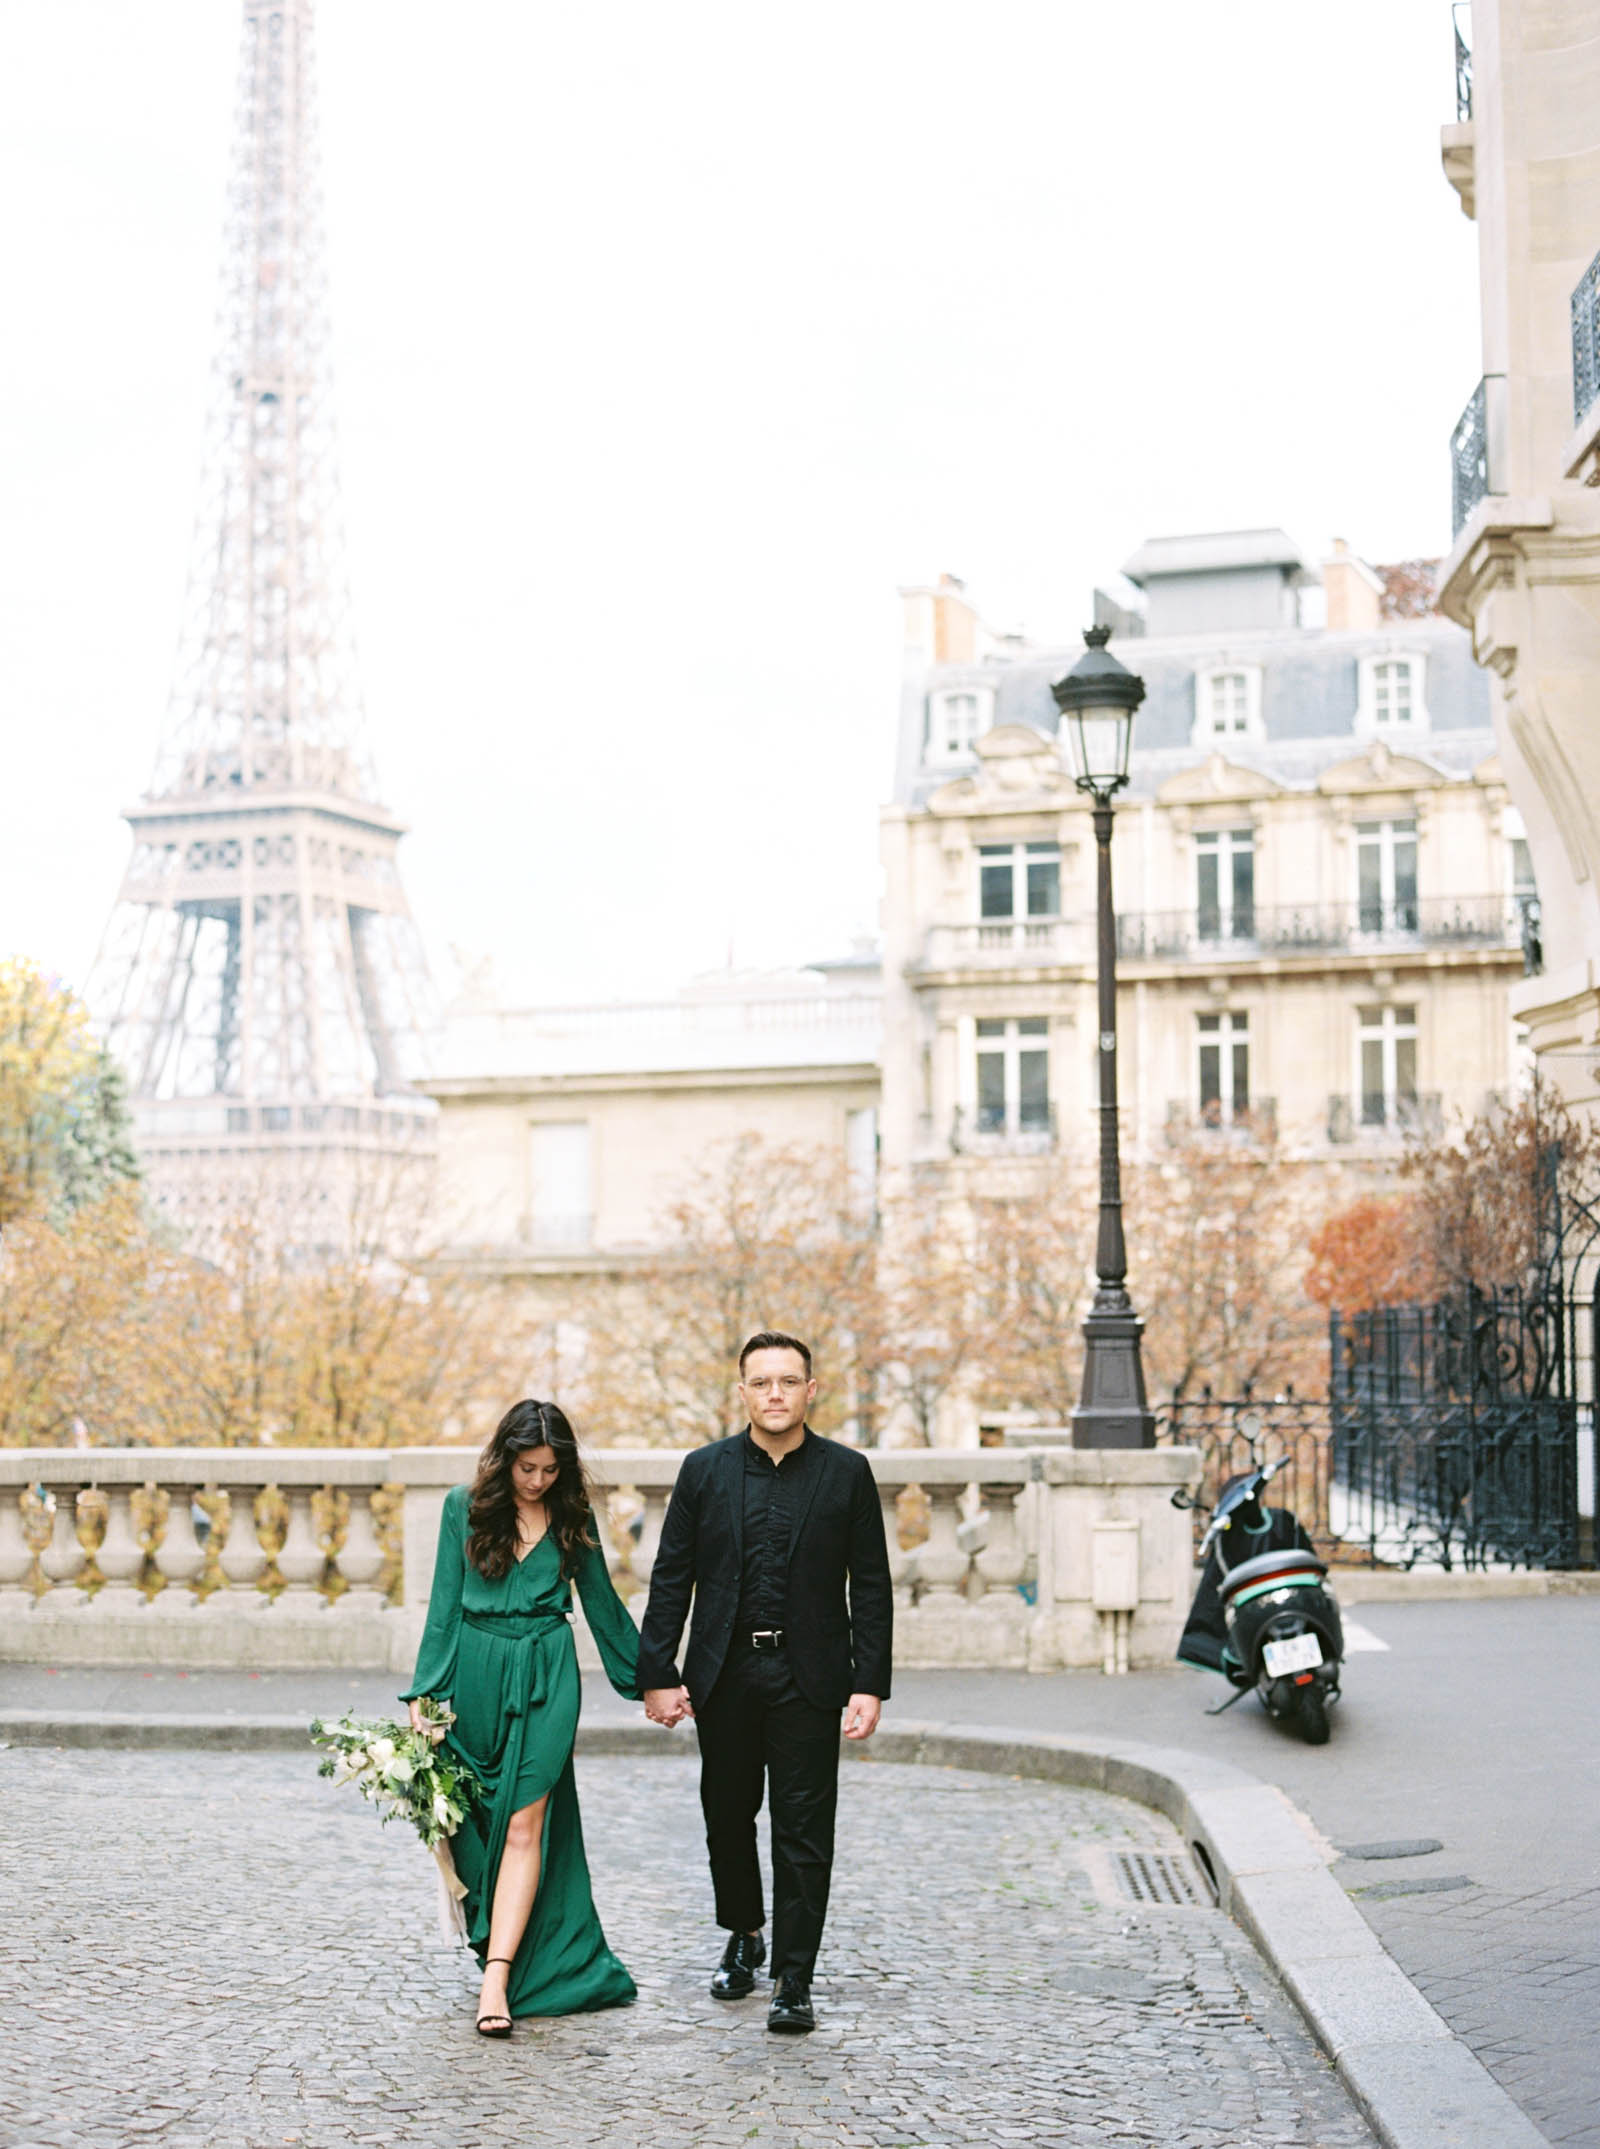 Romantic Engagement Photos - Eiffel Tower - KR Moreno